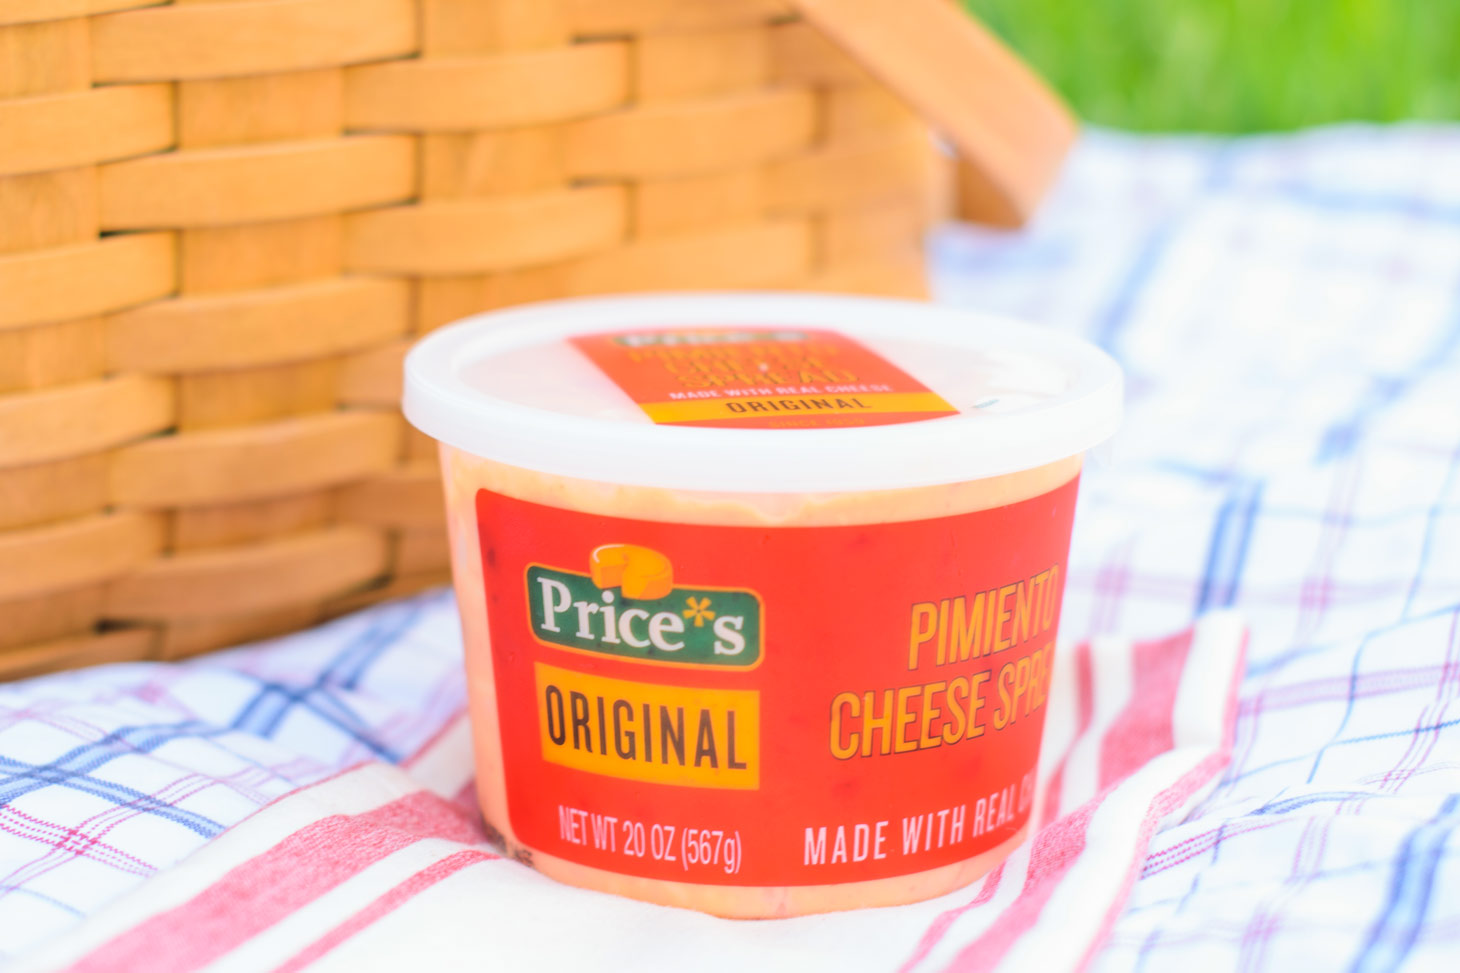 Prices original pimiento cheese spread for a picnic